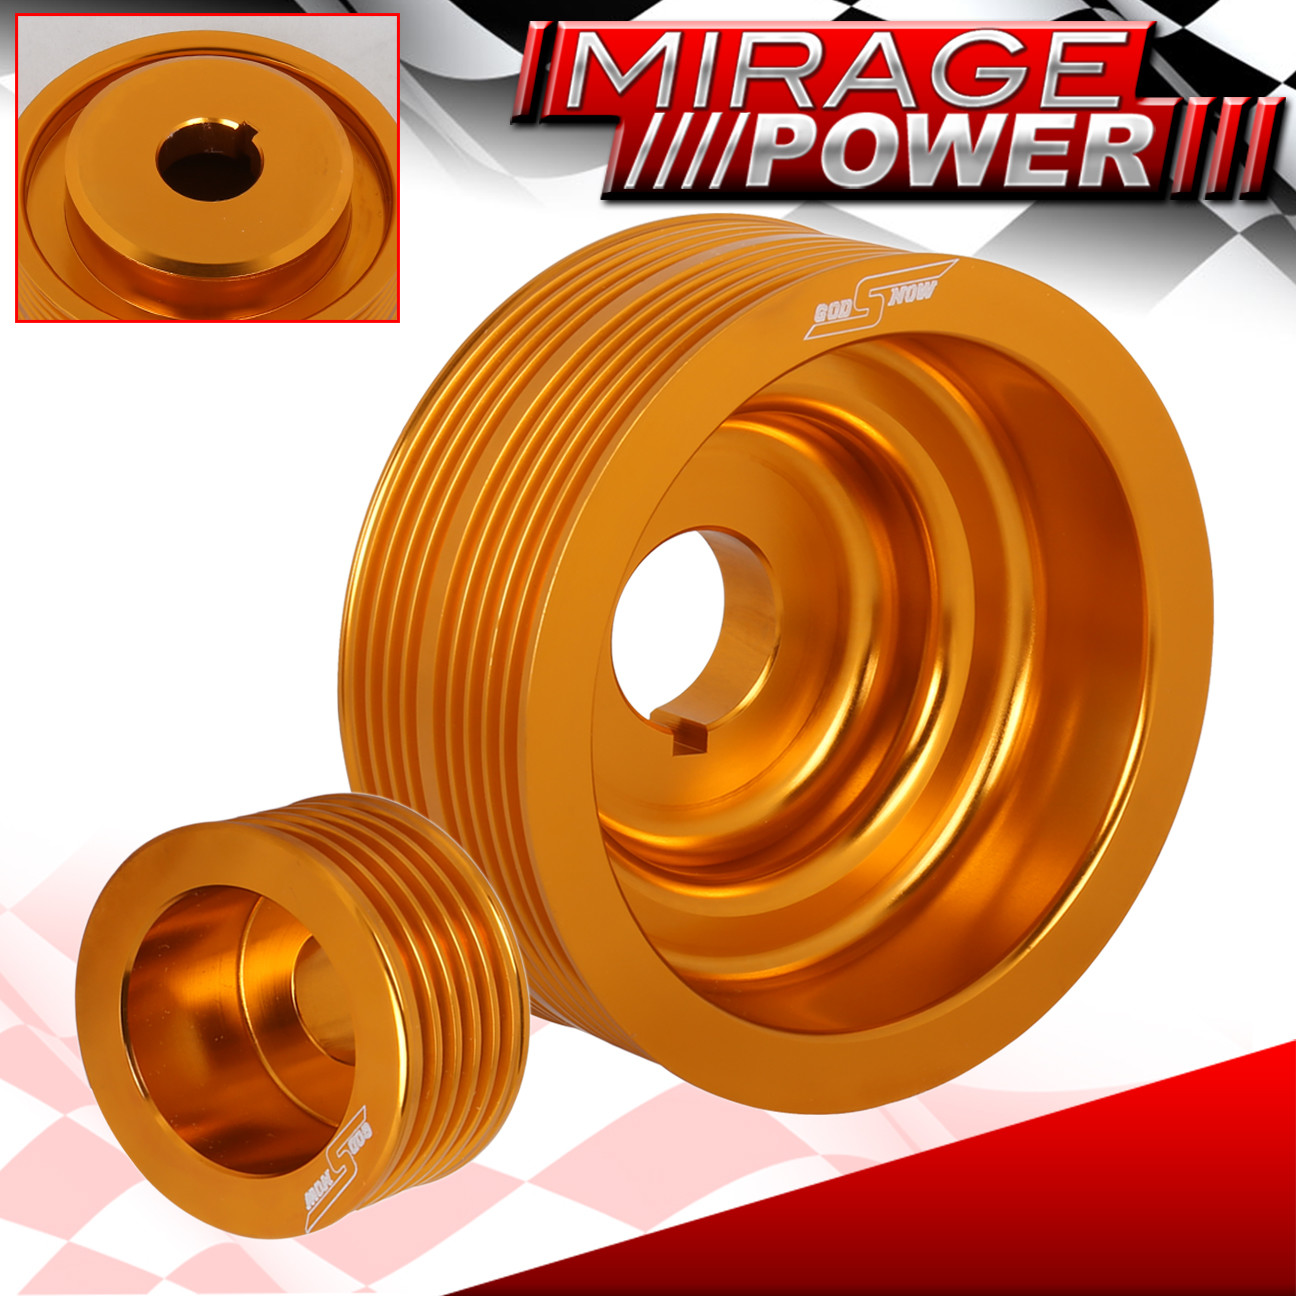 For Subaru Impreza Wrx 7 8 9 20l Turbo Jdm Gold High Under Drive Ej20k Timing Belt Pulleys Crank Pulley